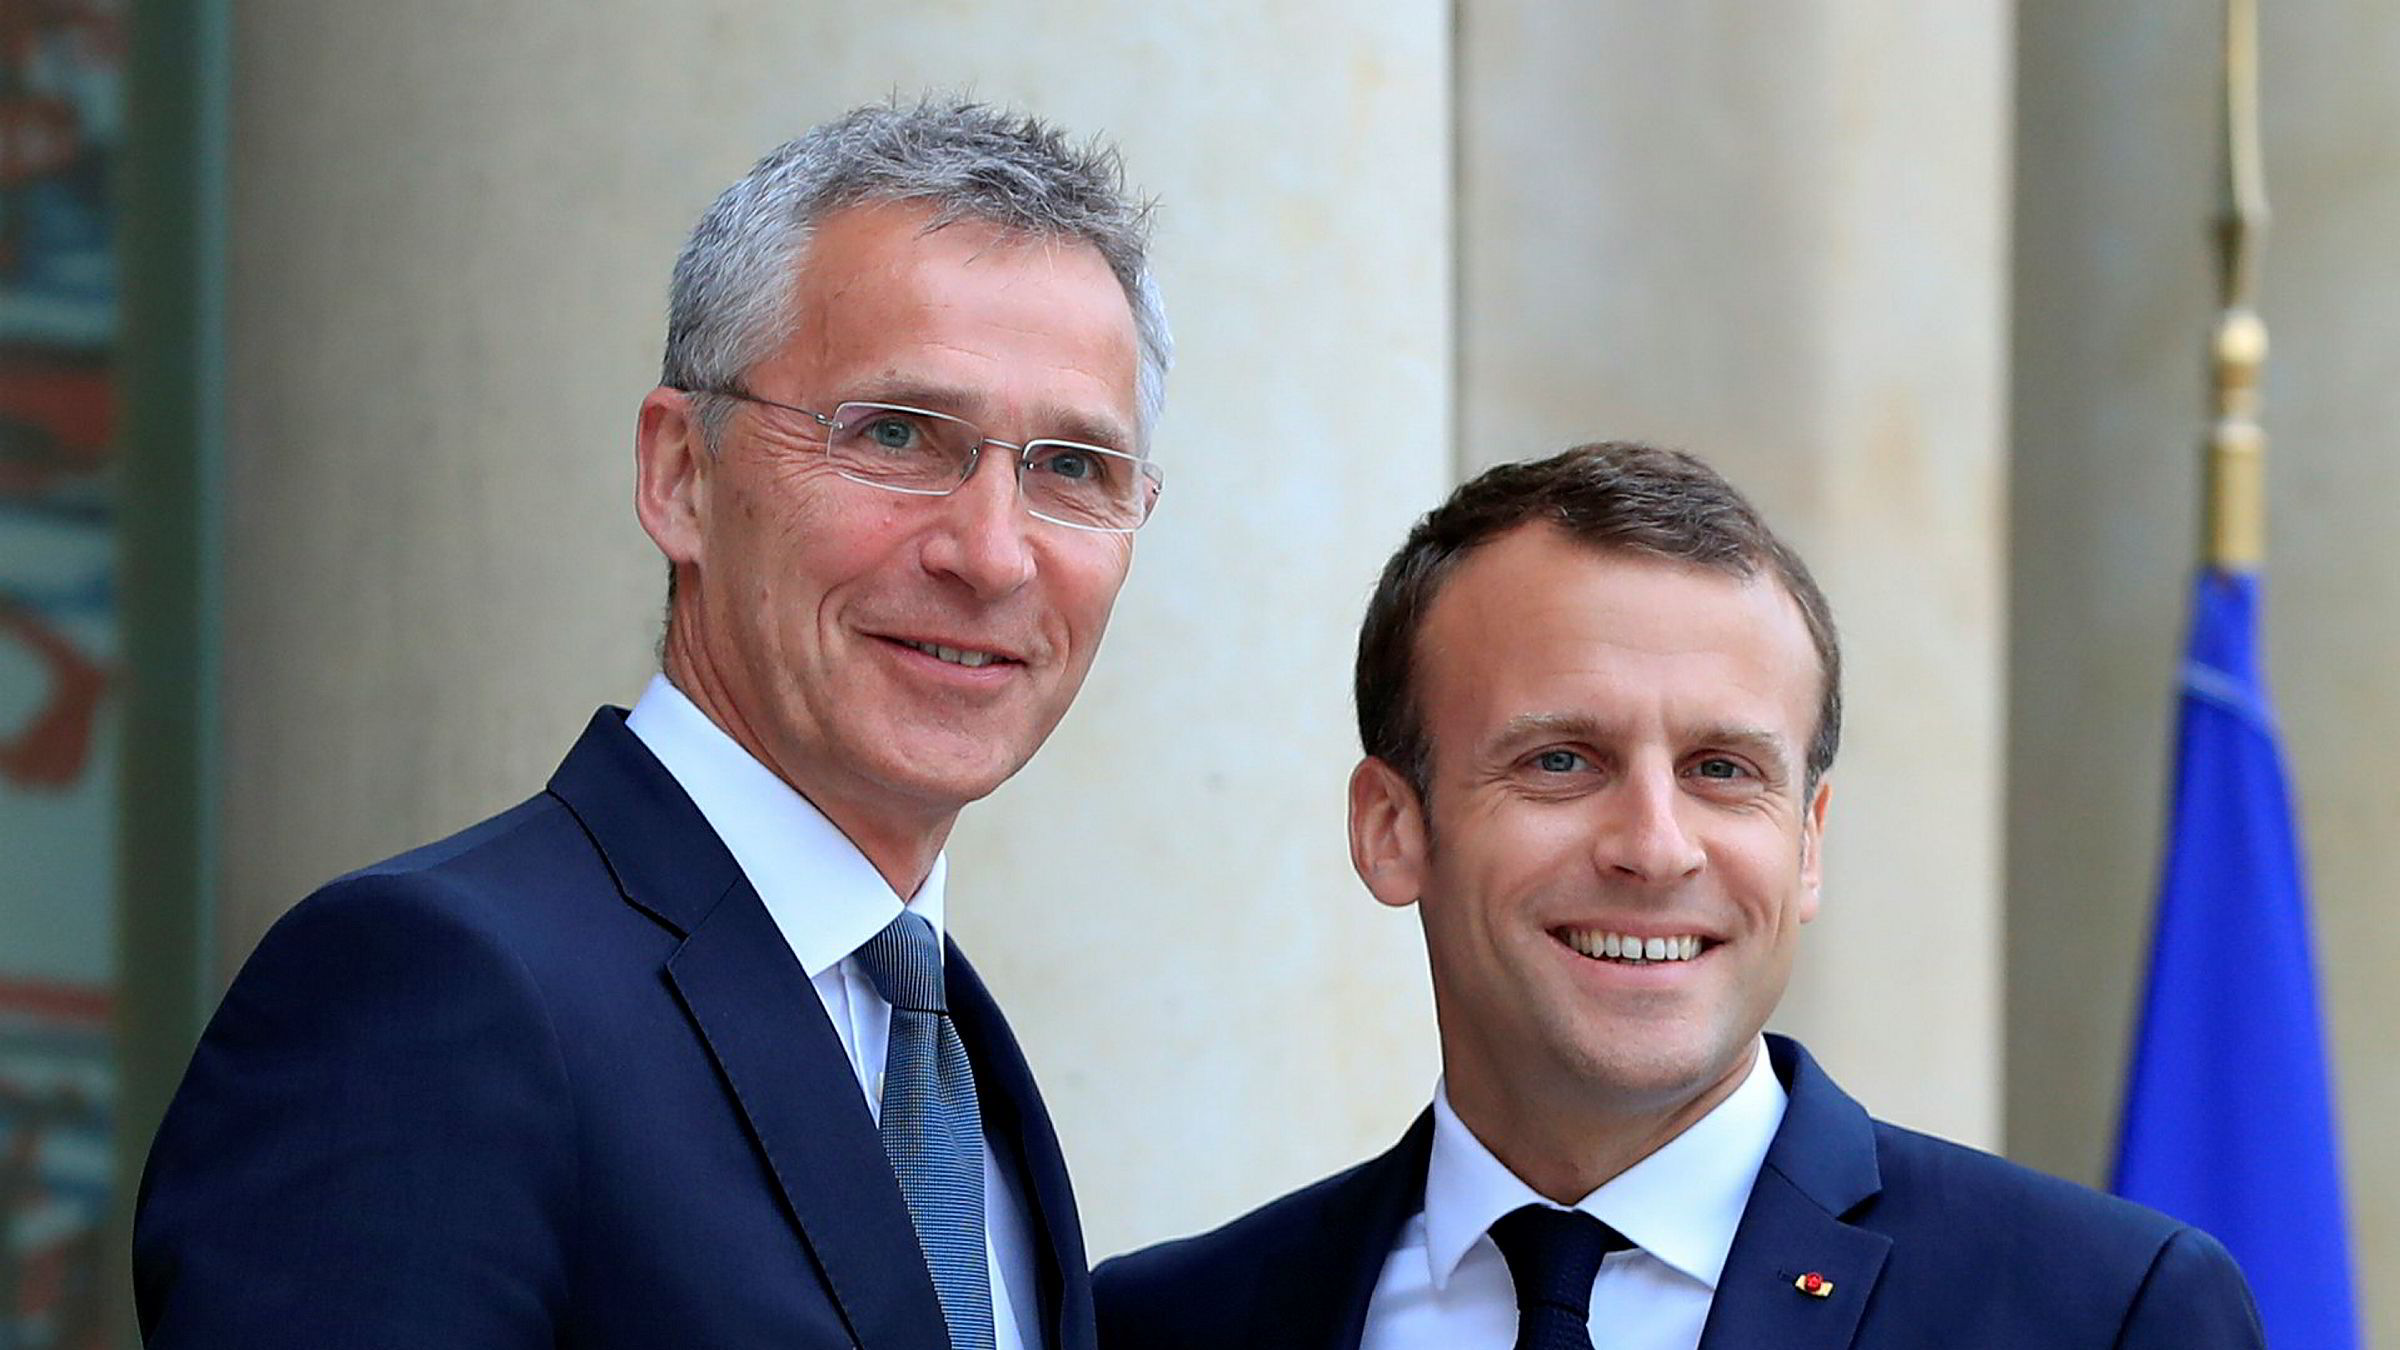 Natos generalsekretær Jens Stoltenberg møter Frankrikes president Emmanuel Macron i dag.